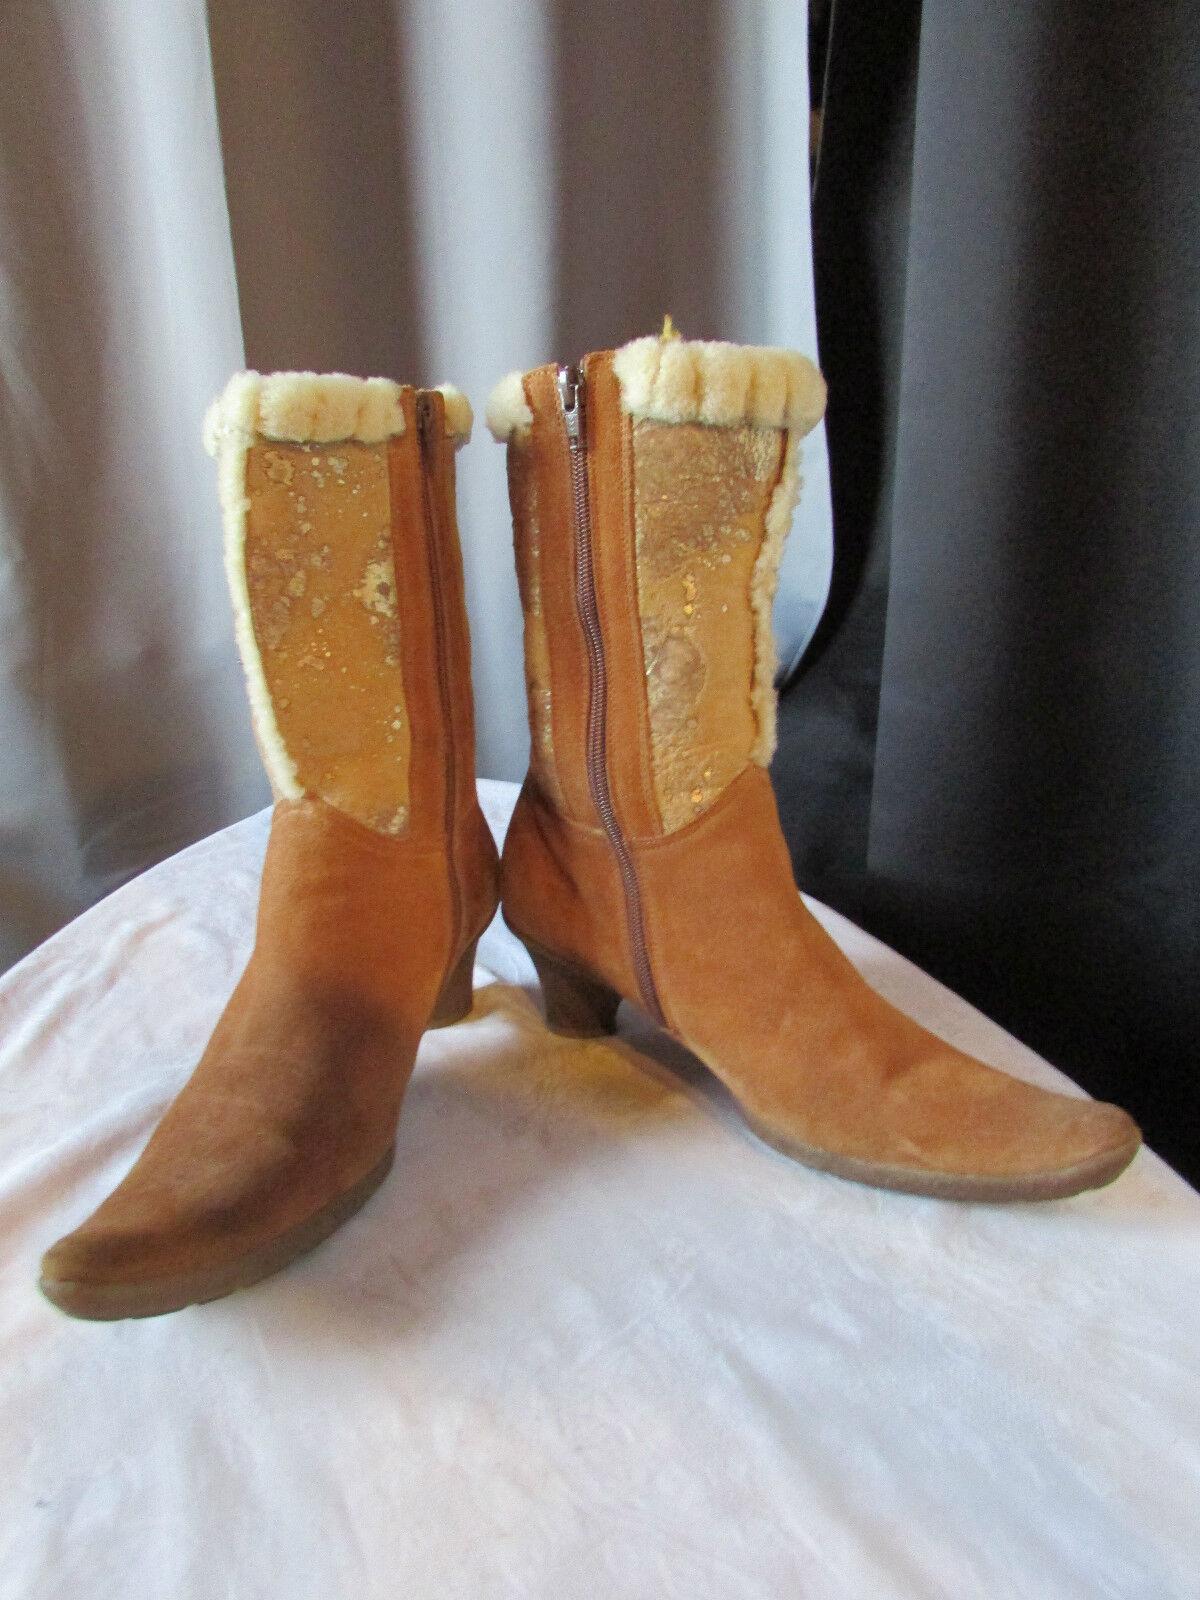 Boots bottines mouton retourné camel daim daim daim camel marzetti 39 7fda17